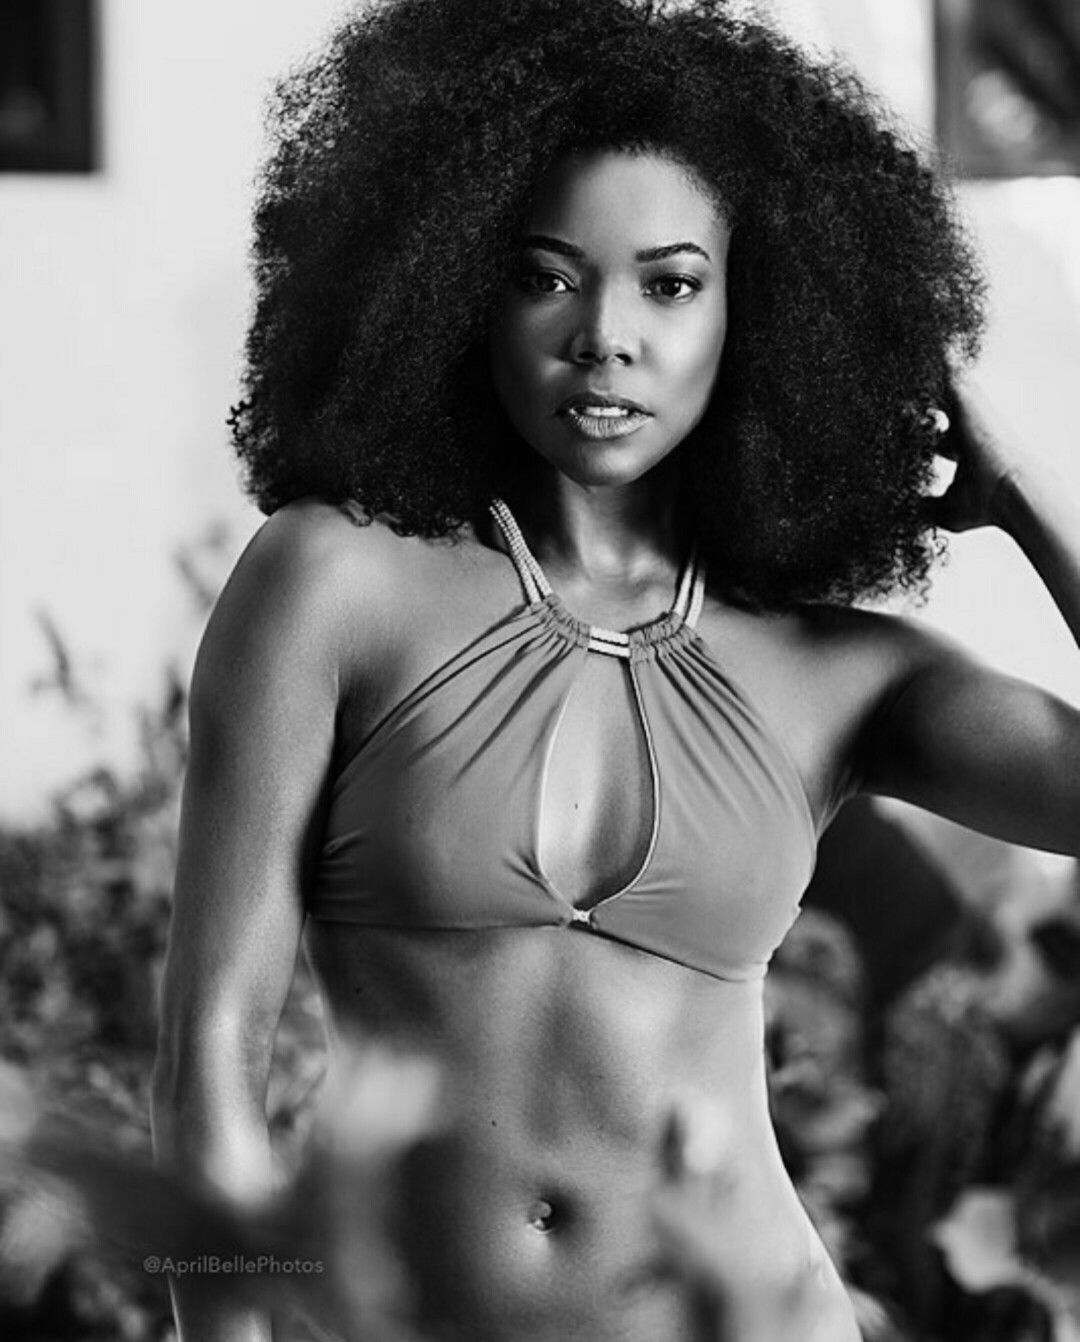 Hot Gabrielle Monique Union Wade nude photos 2019